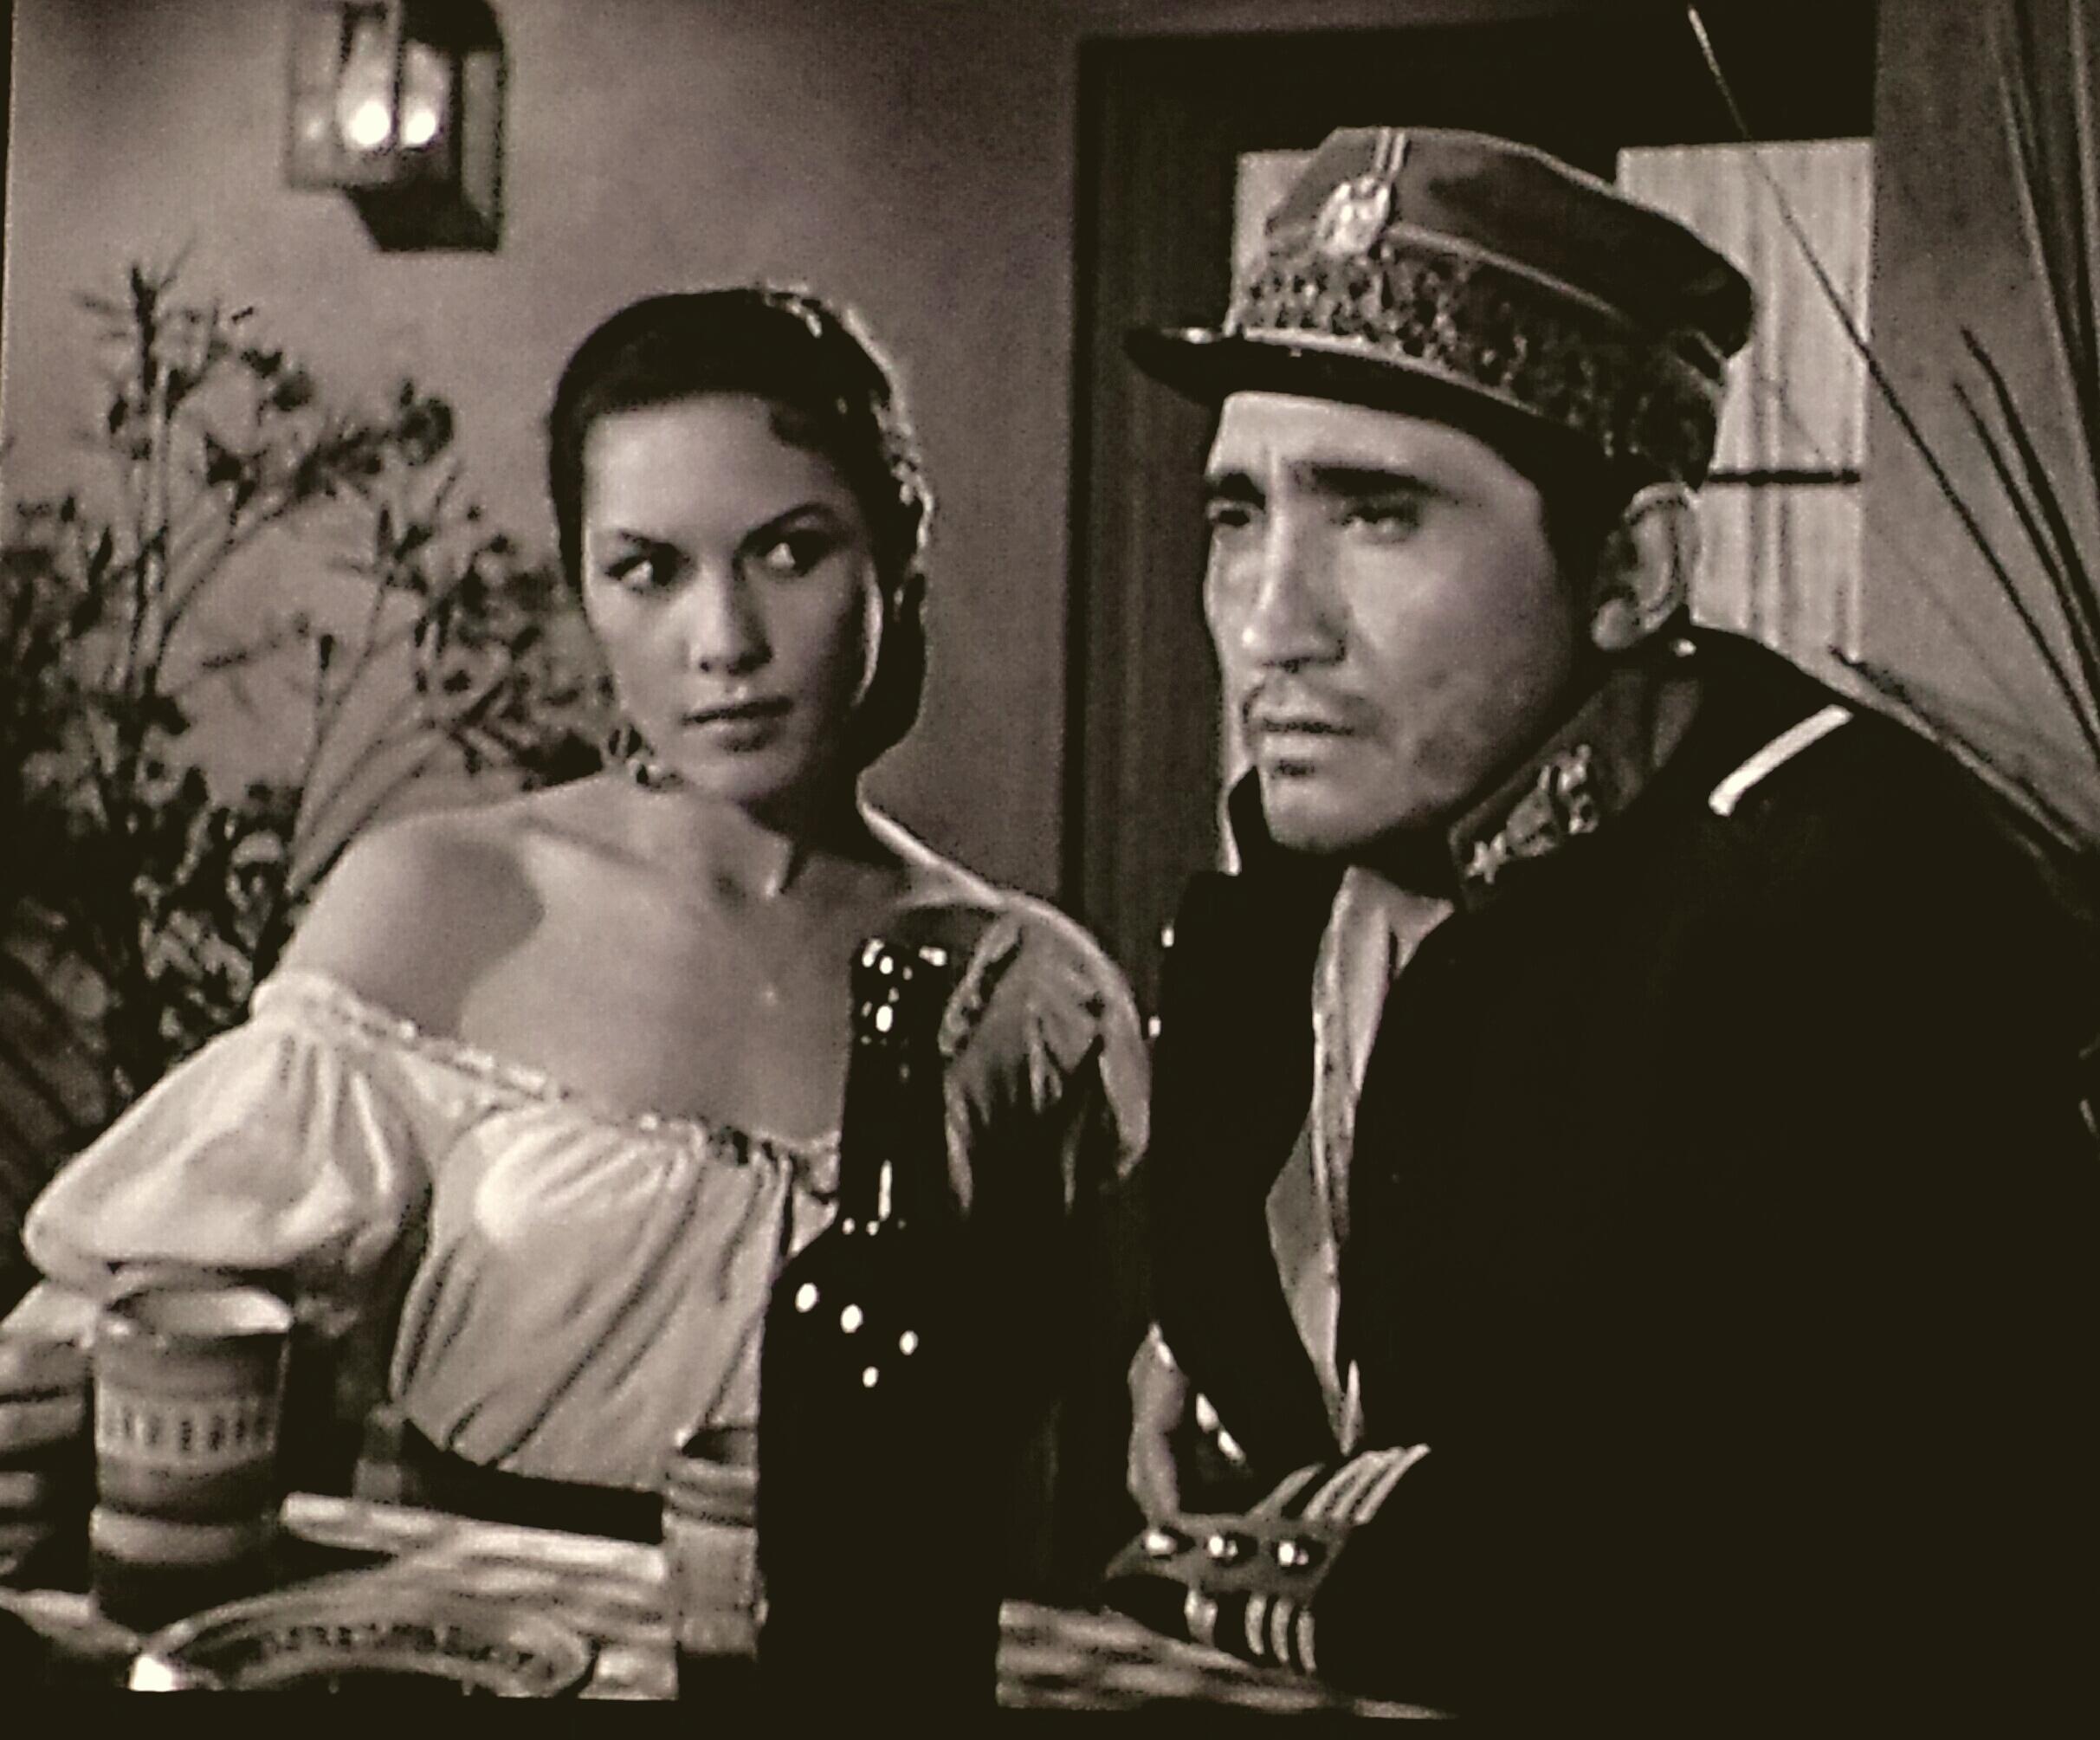 Rodolfo Acosta and Carmen Austin in Cheyenne (1955)